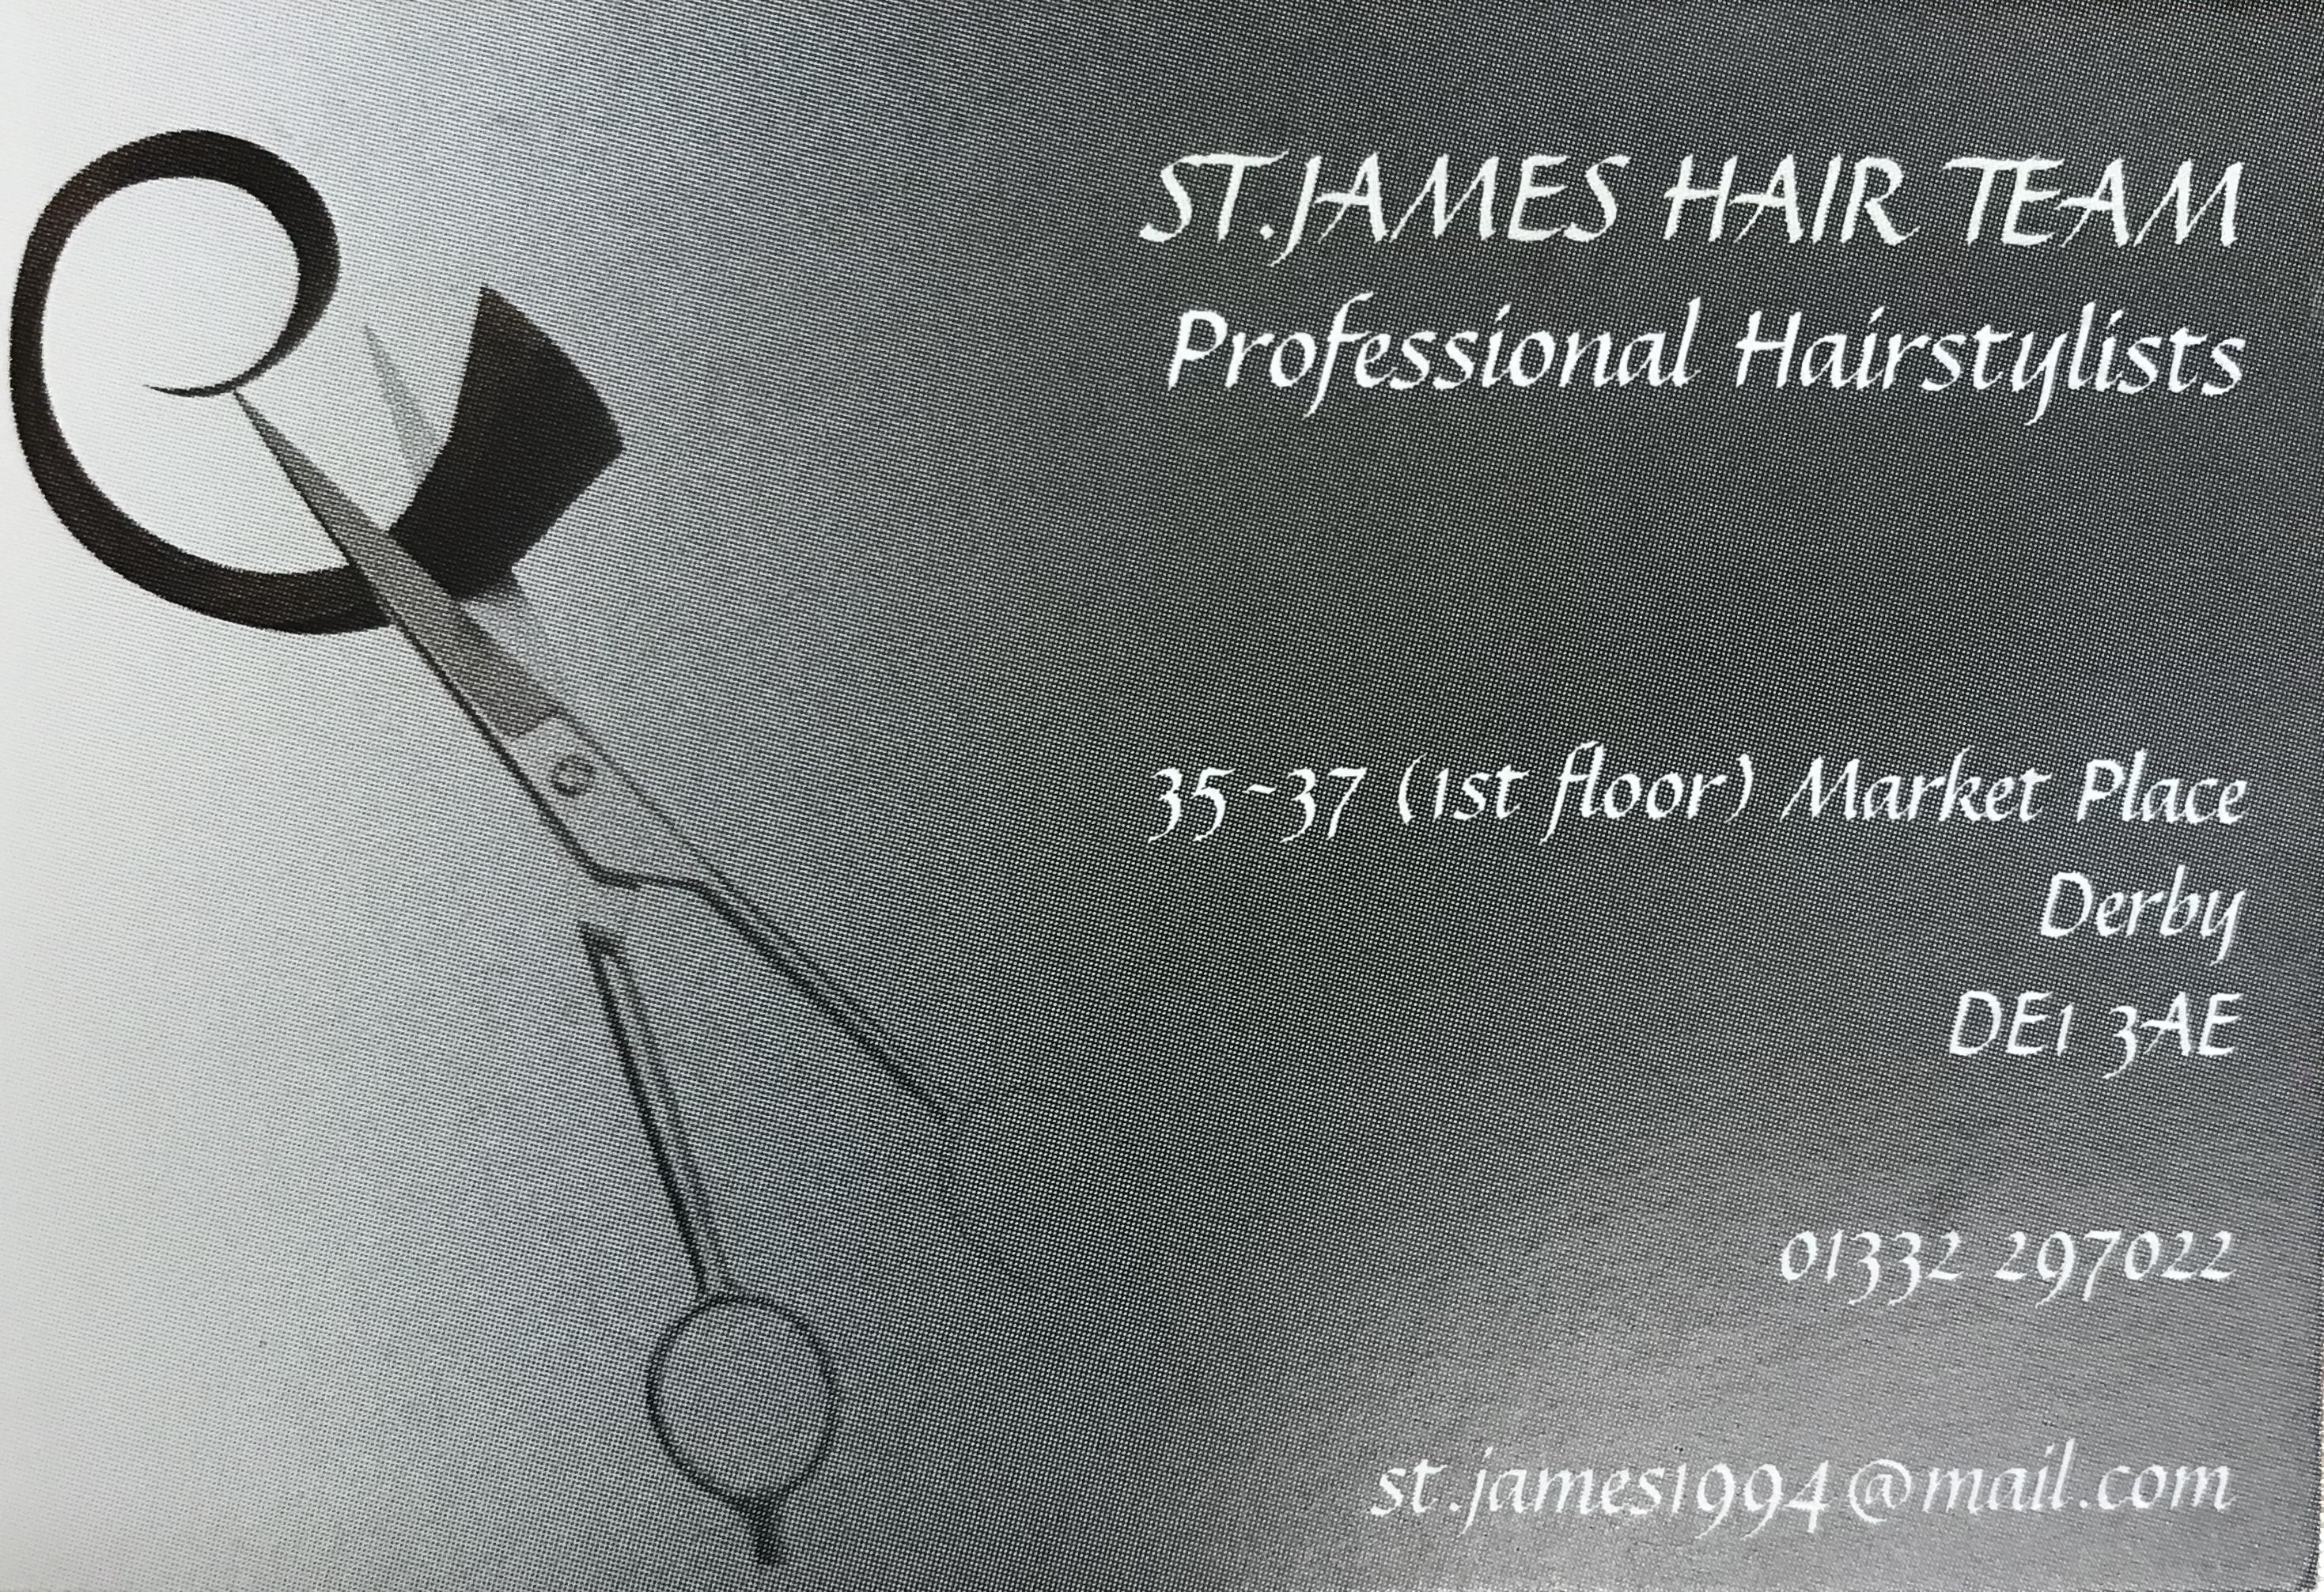 St James Hair Team